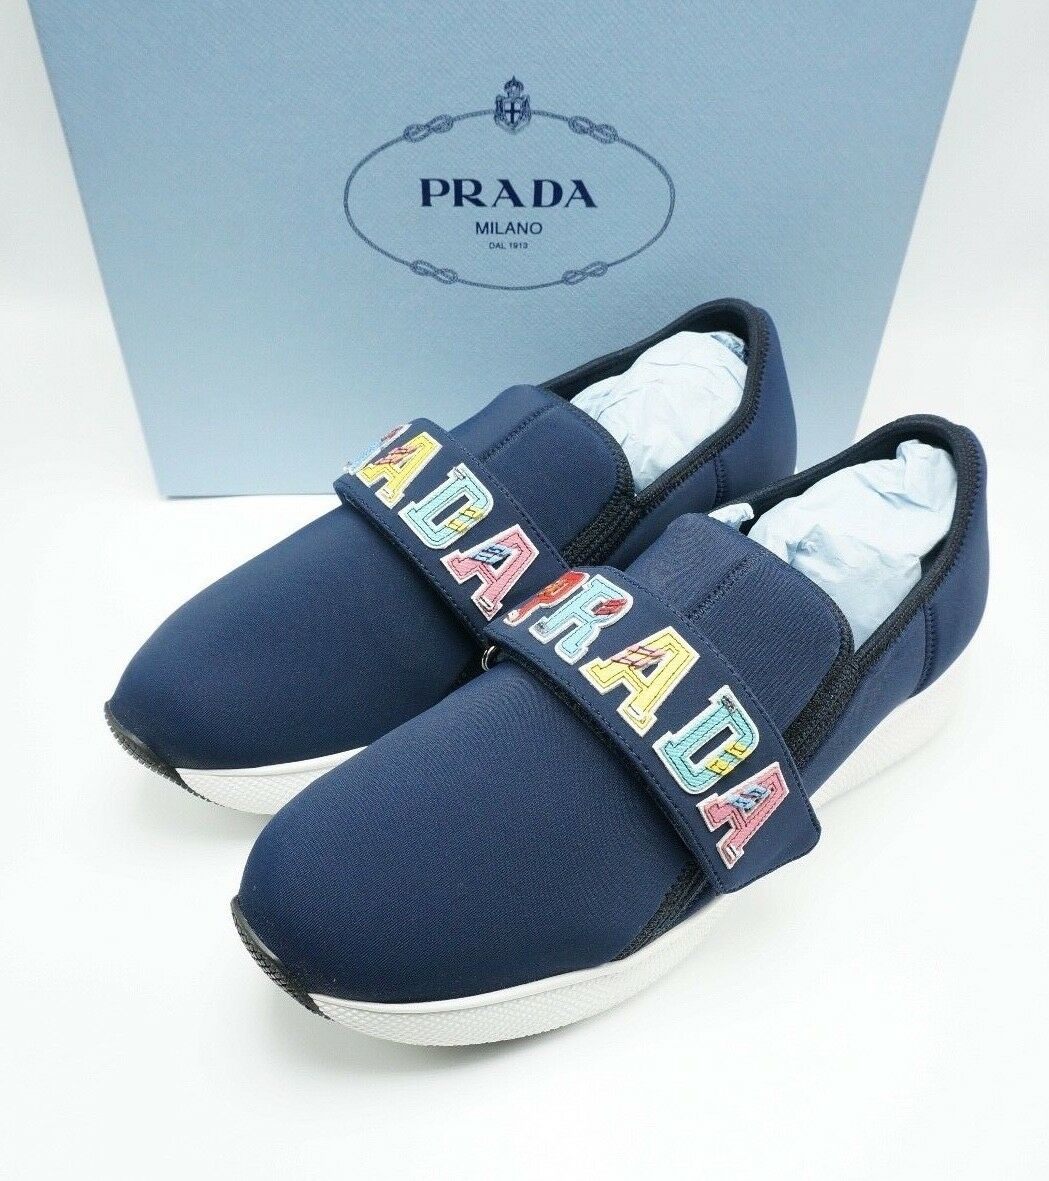 Prada AUTH  750 Neoprene & Saffiano Leather Logo Sneakers Navy bluee Multi 39.5